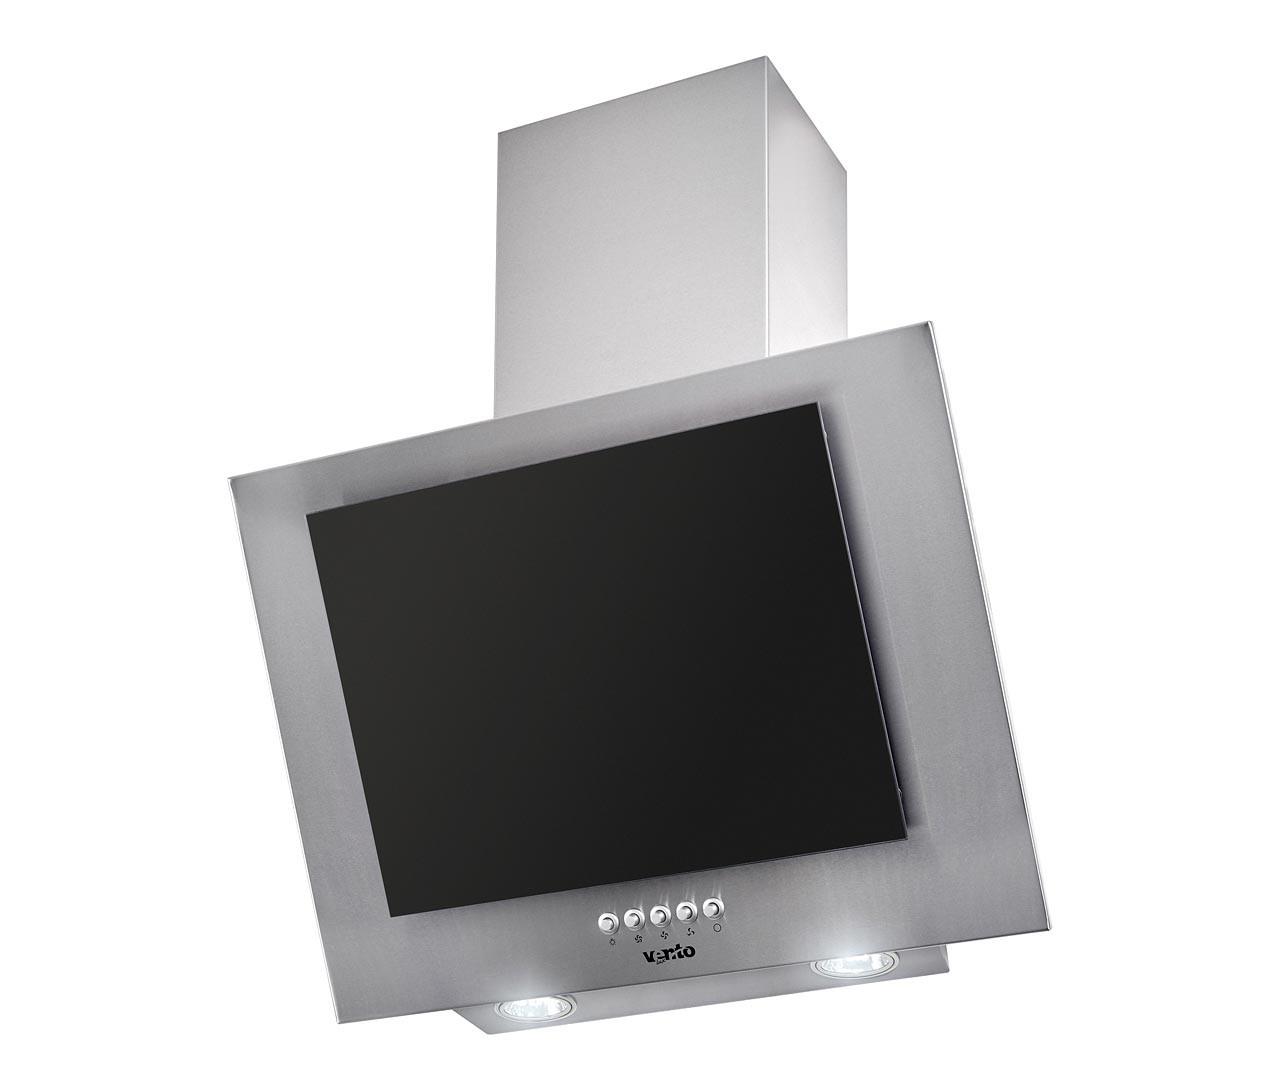 Вытяжка FIORE 60 X/BG (750) PB